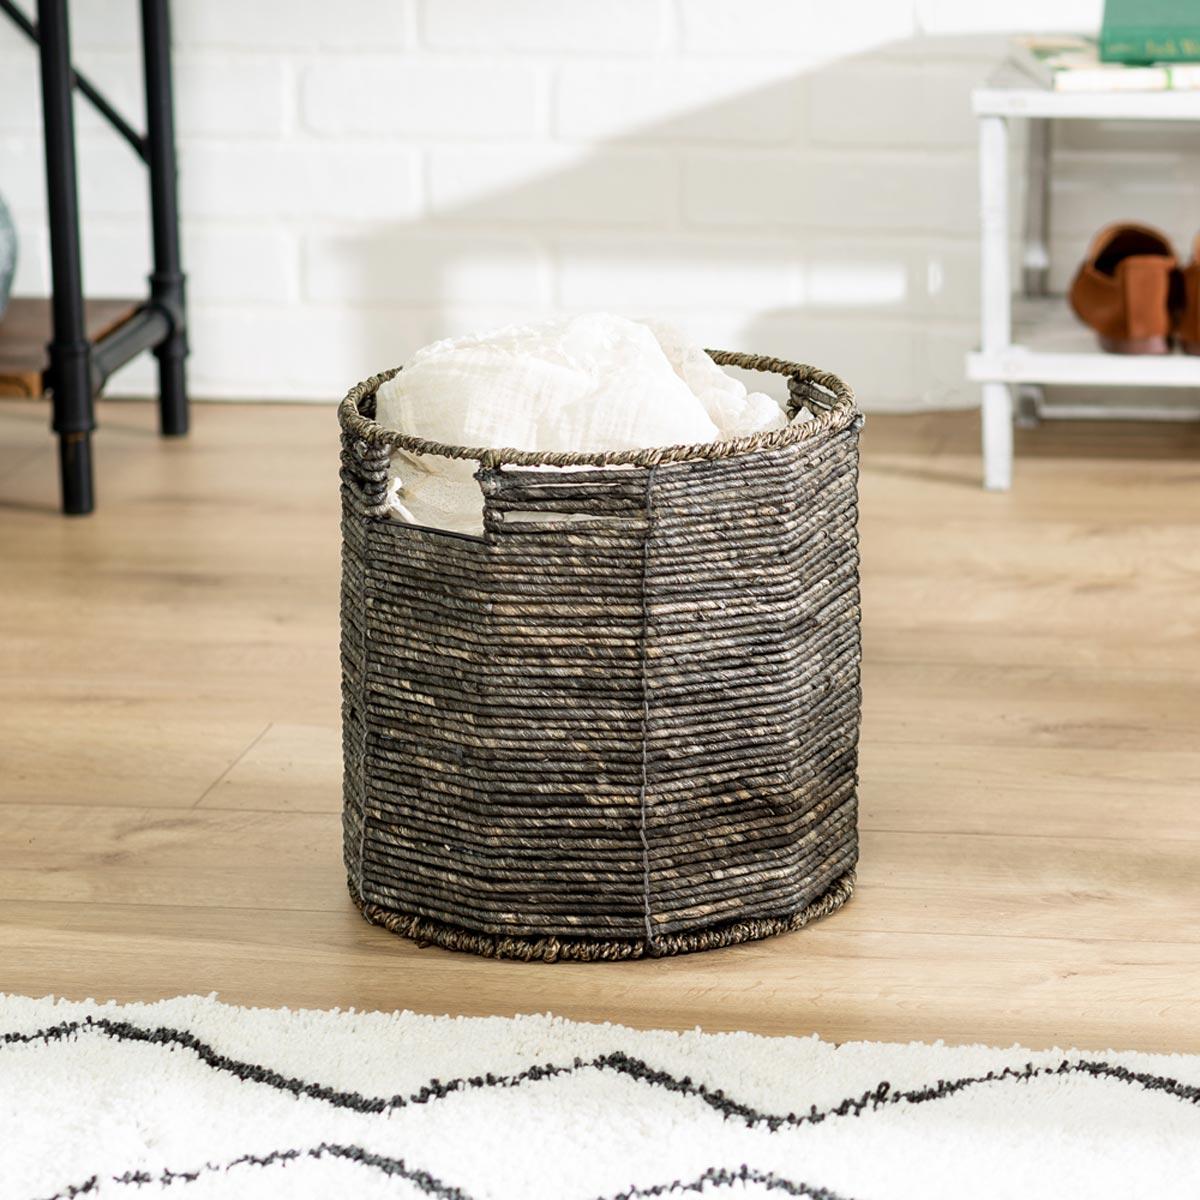 11 in. x 11 in. Geo Round Woven & Steel-Frame Storage Basket, Small